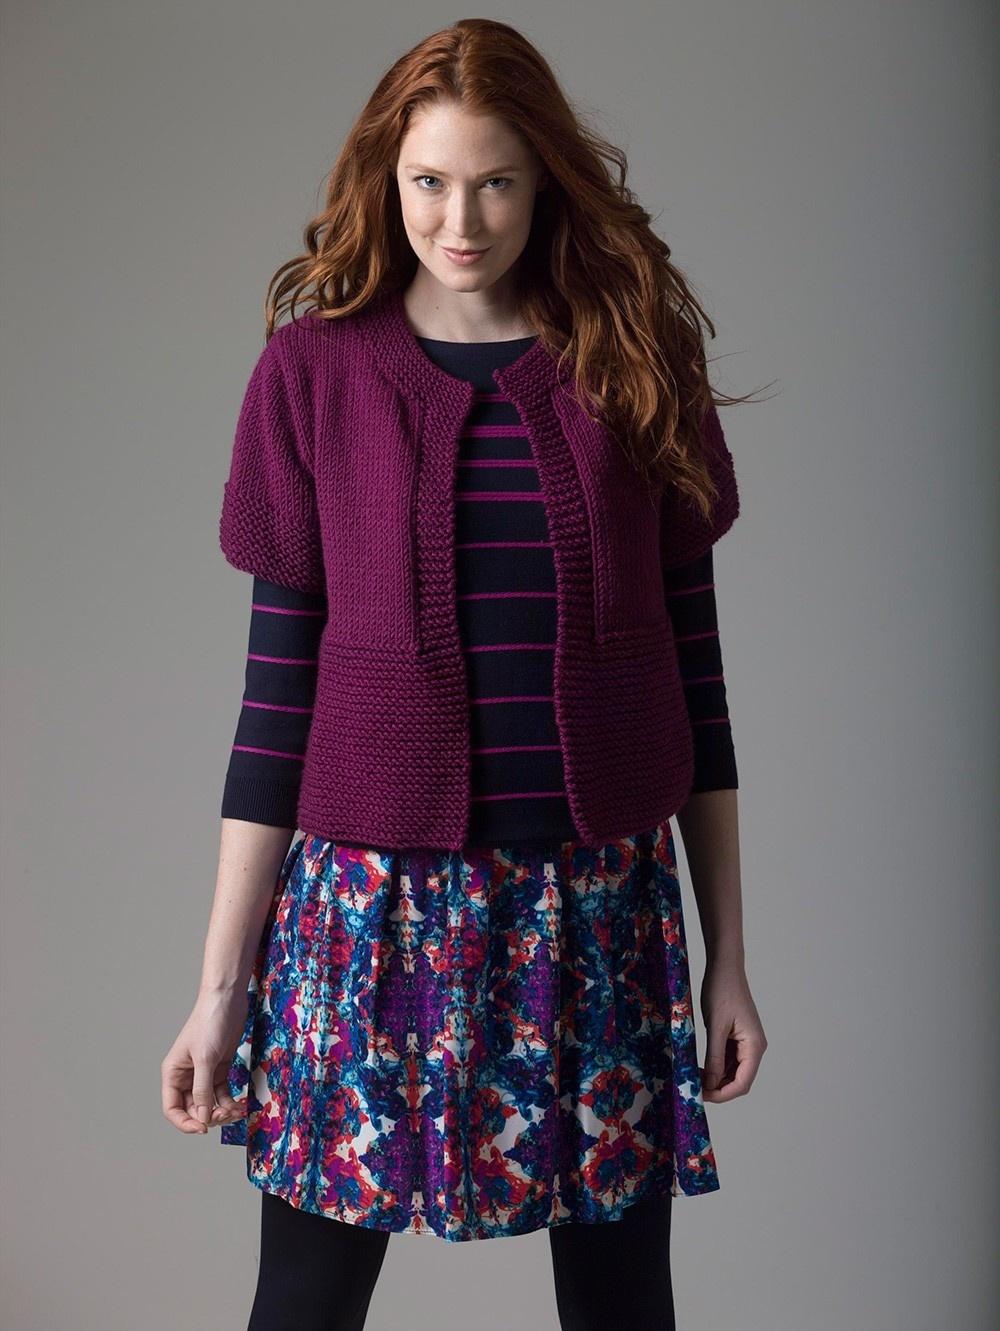 Beginner Knit Cardi